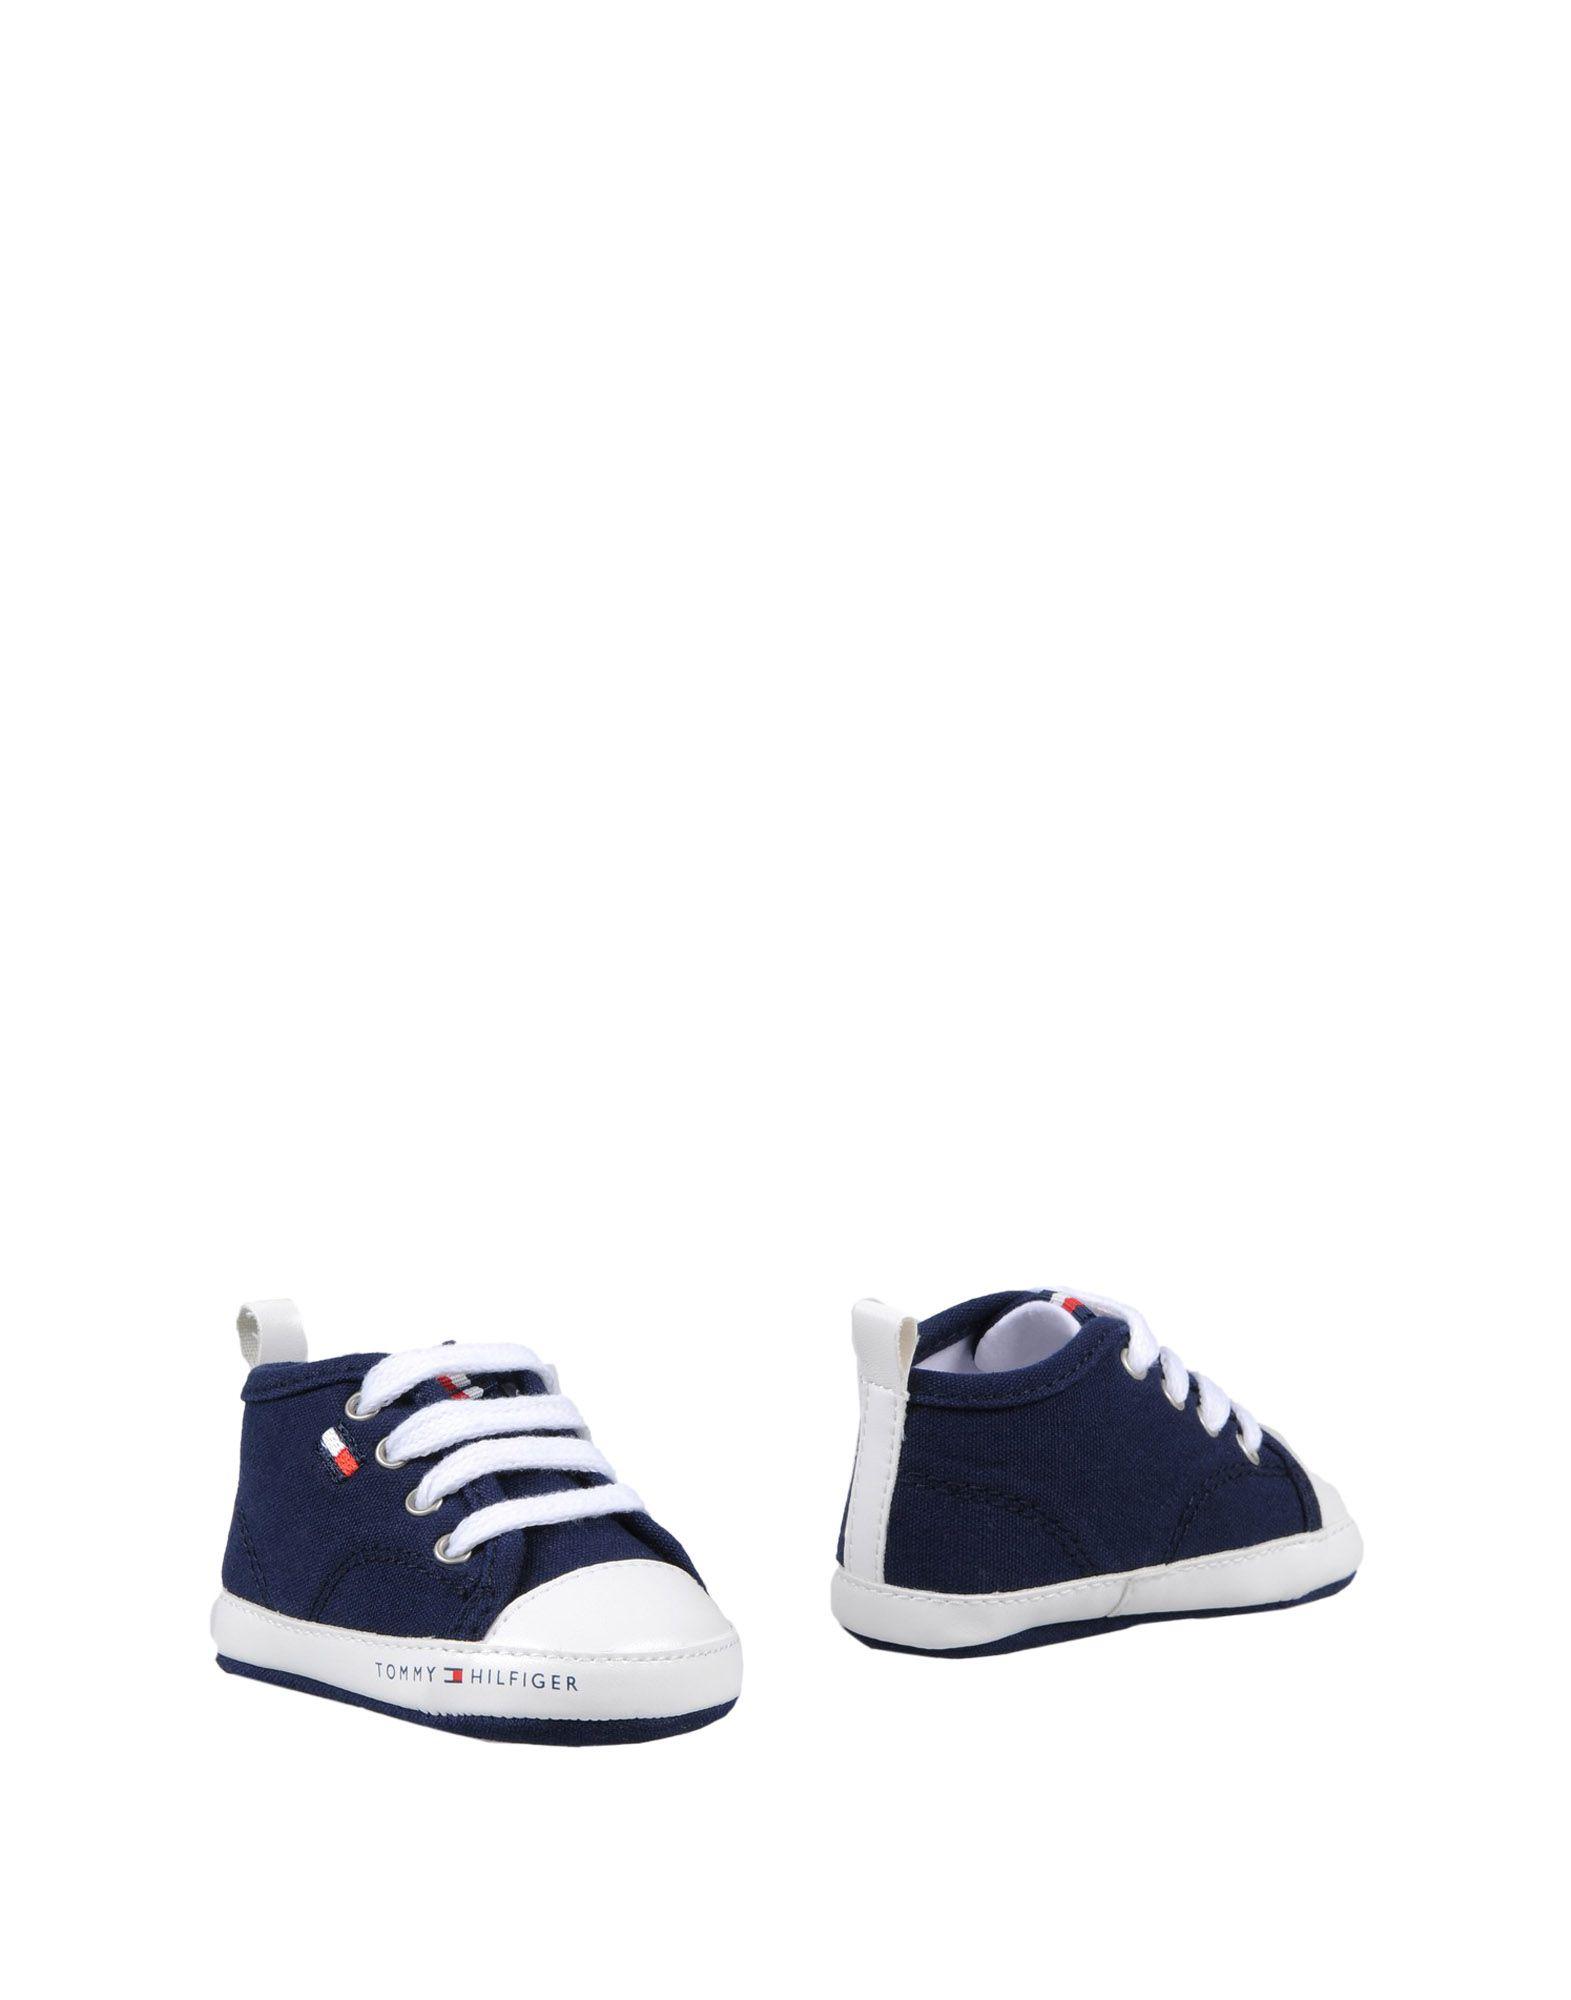 TOMMY HILFIGER Обувь для новорожденных littleones® обувь для новорожденных